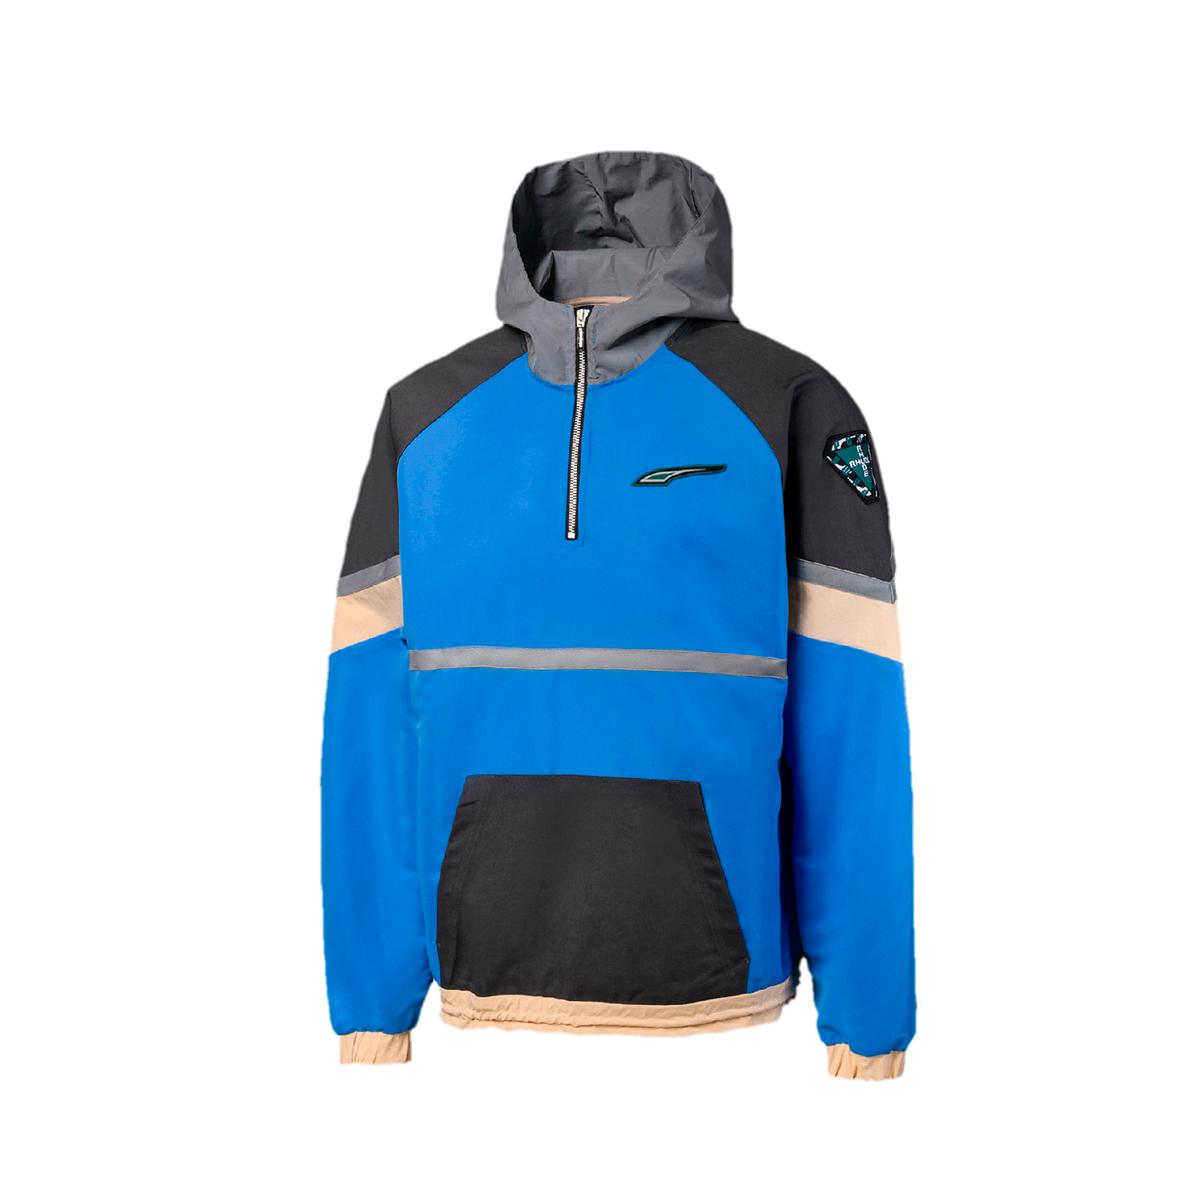 PUMA x RHUDE HZ Jacket(PALACE BLUE)(プーマ X ルード HZ ジャケット)【メンズ】【ジャケット】【20SP-S】